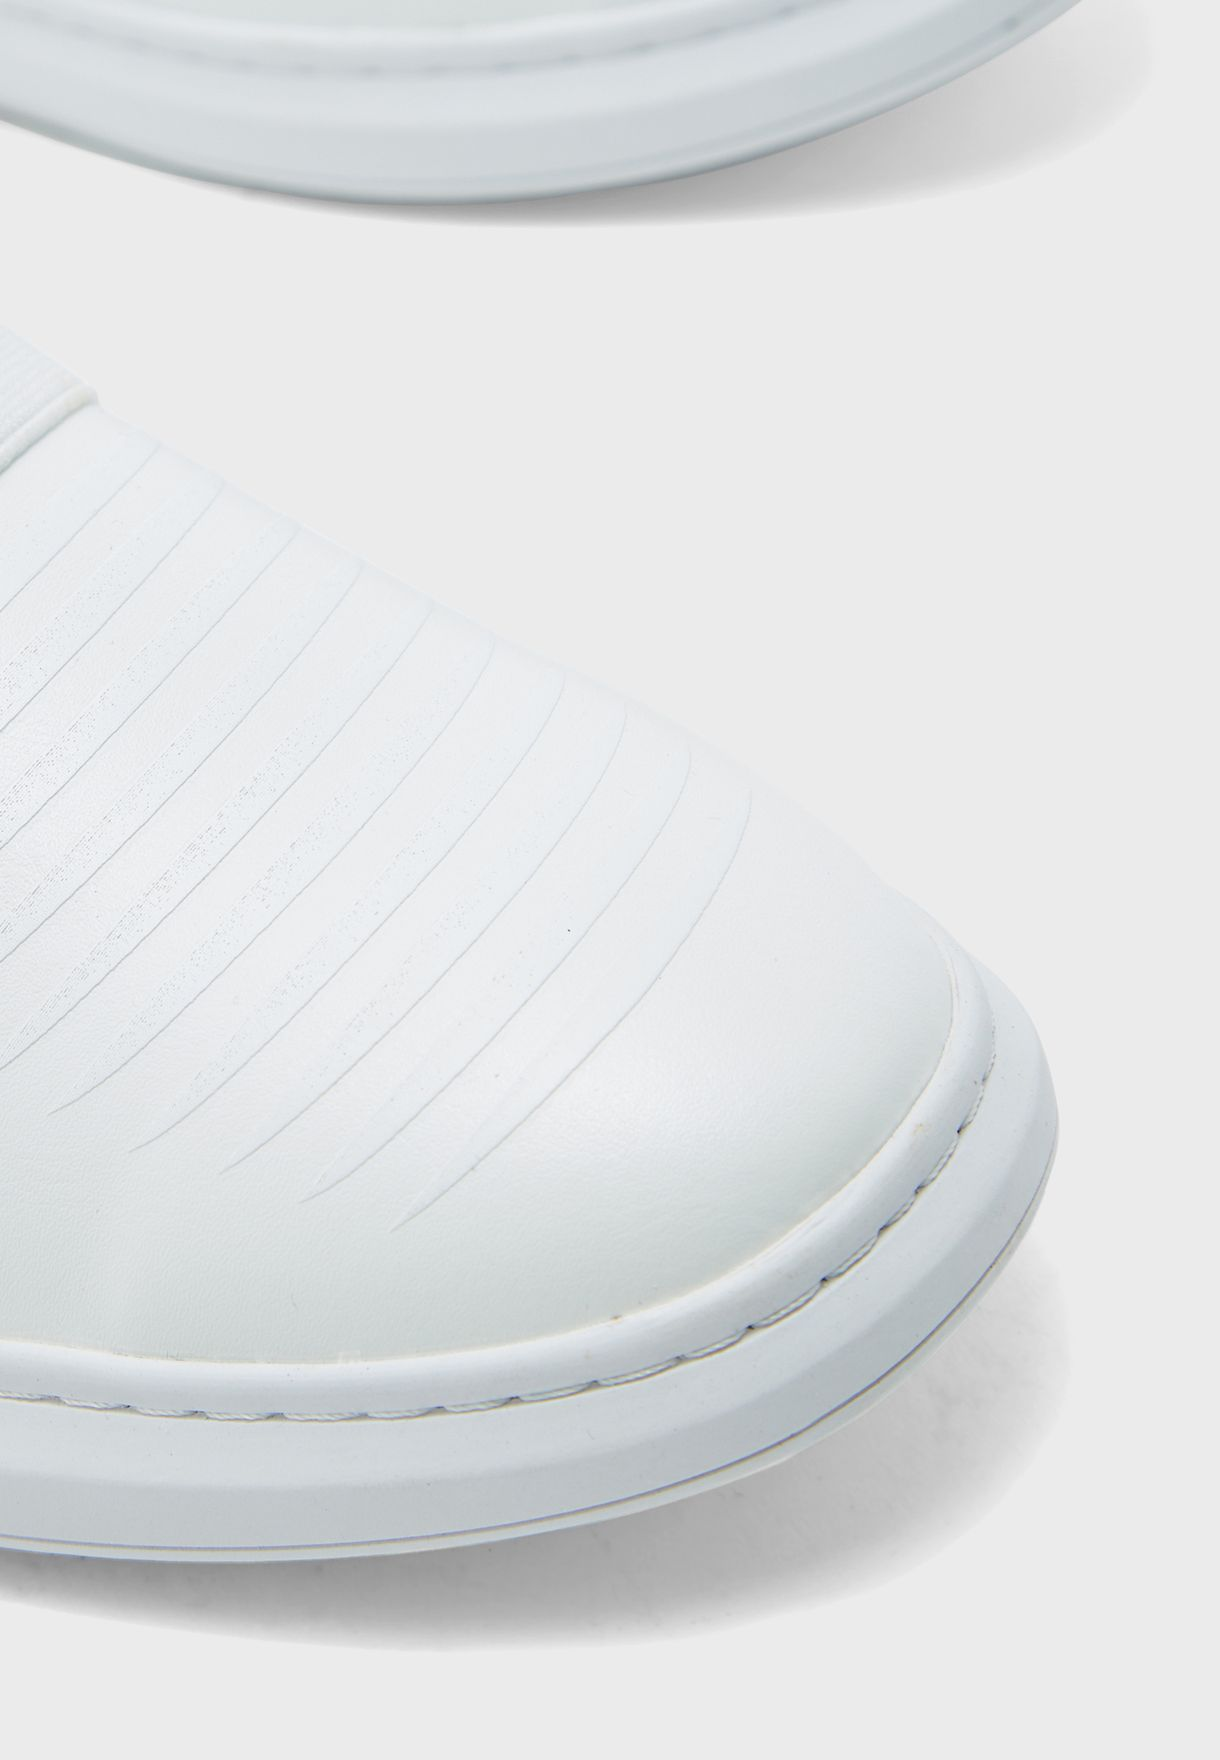 Elastic Detail Casual Slip Ons